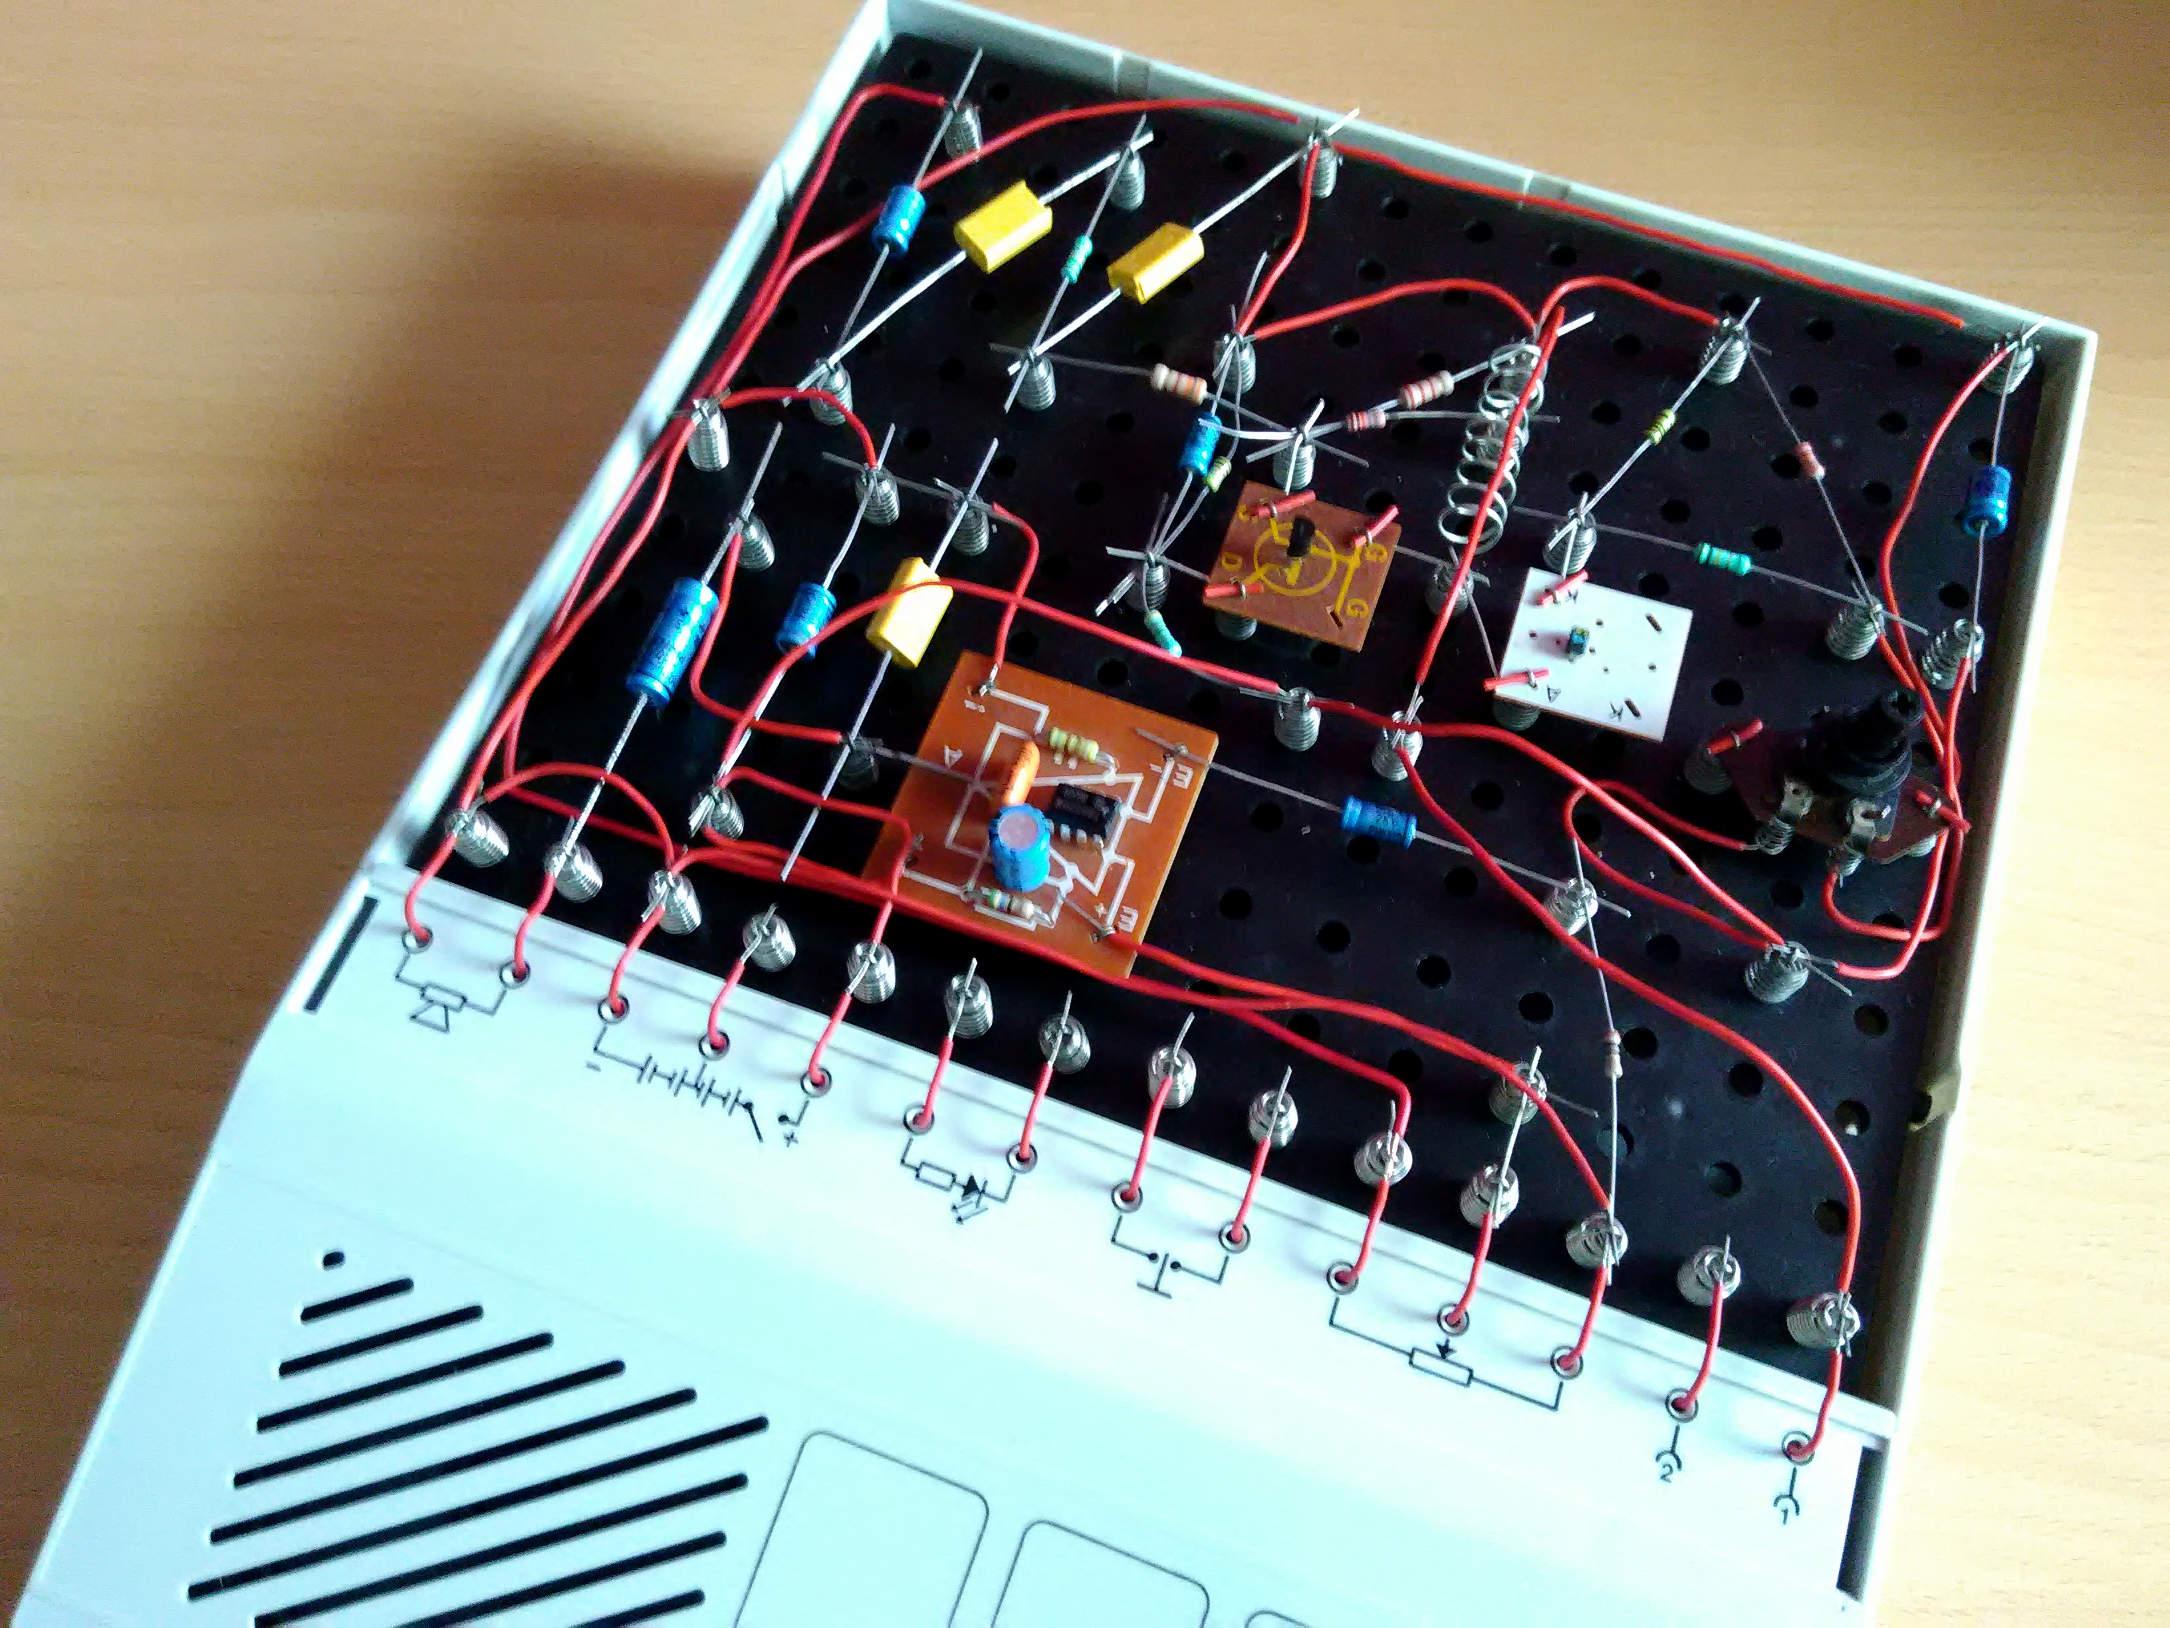 Elektronik Experimente | Diverse Schaltungen